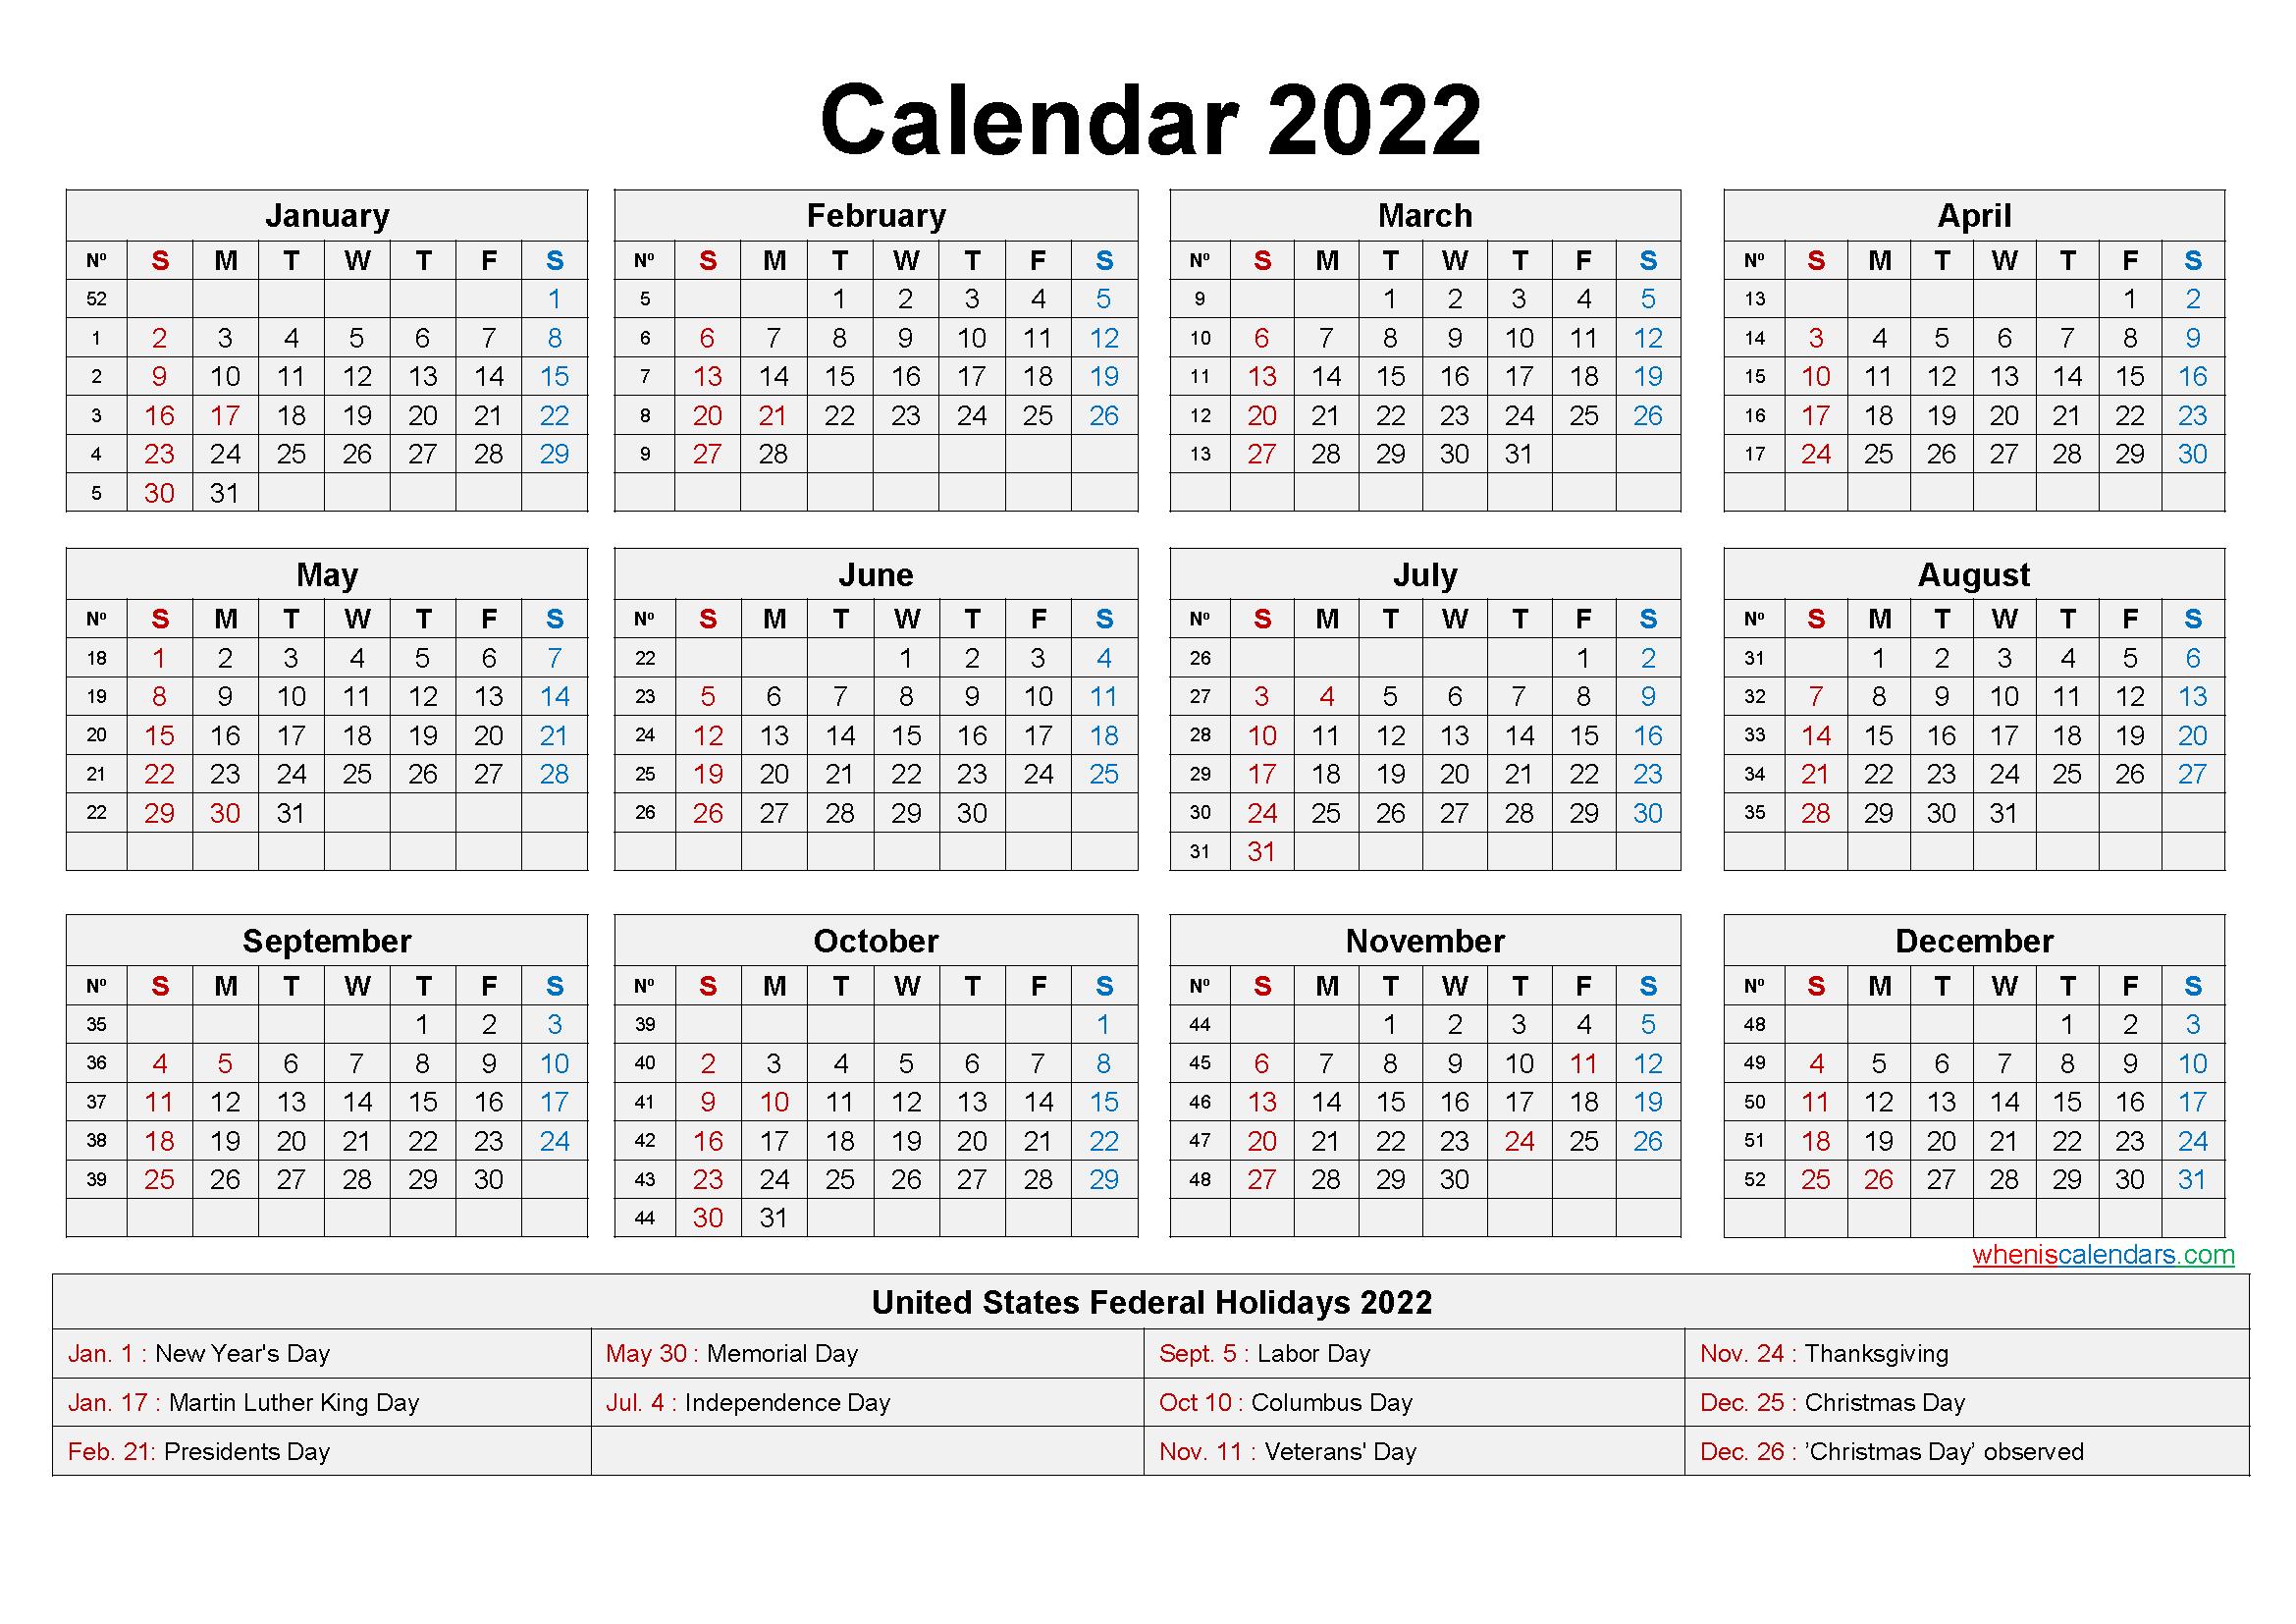 monthly calendar 2022, printable calendar 2022 paper orientation: Large Desk Calendar 2022 with Holidays - Free Printable ...